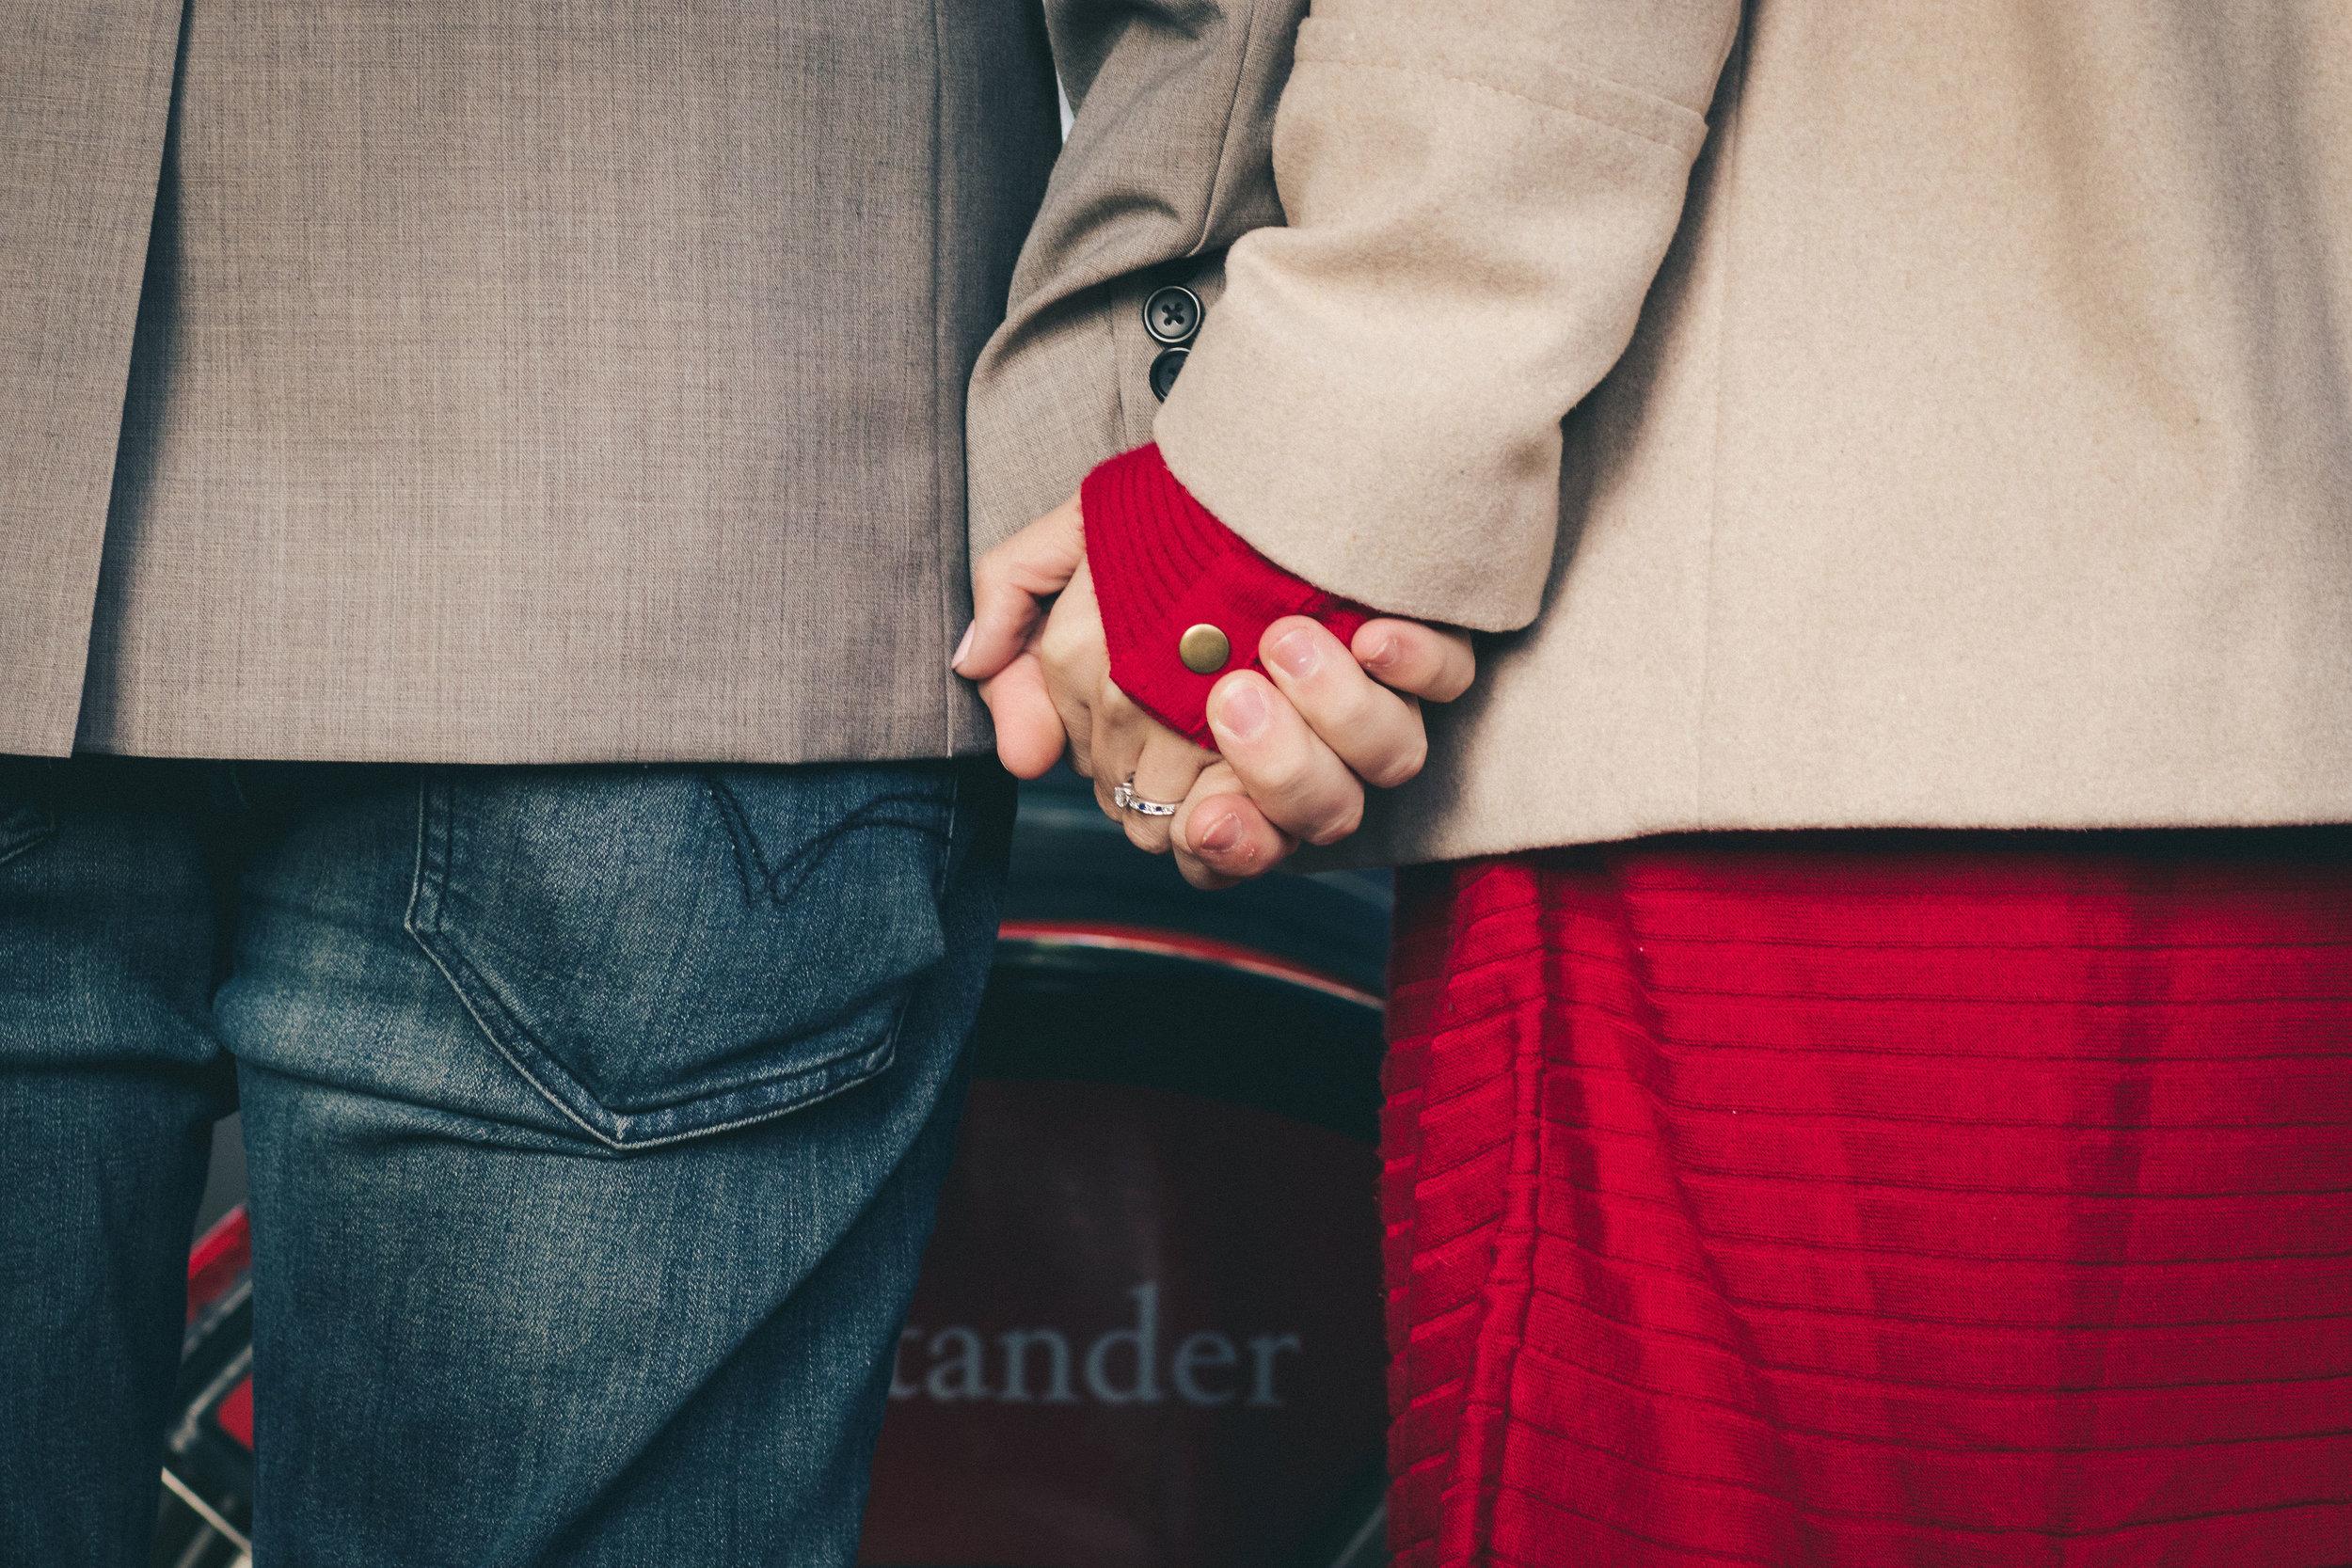 Veronica Taylor Photography - weddings & portraits